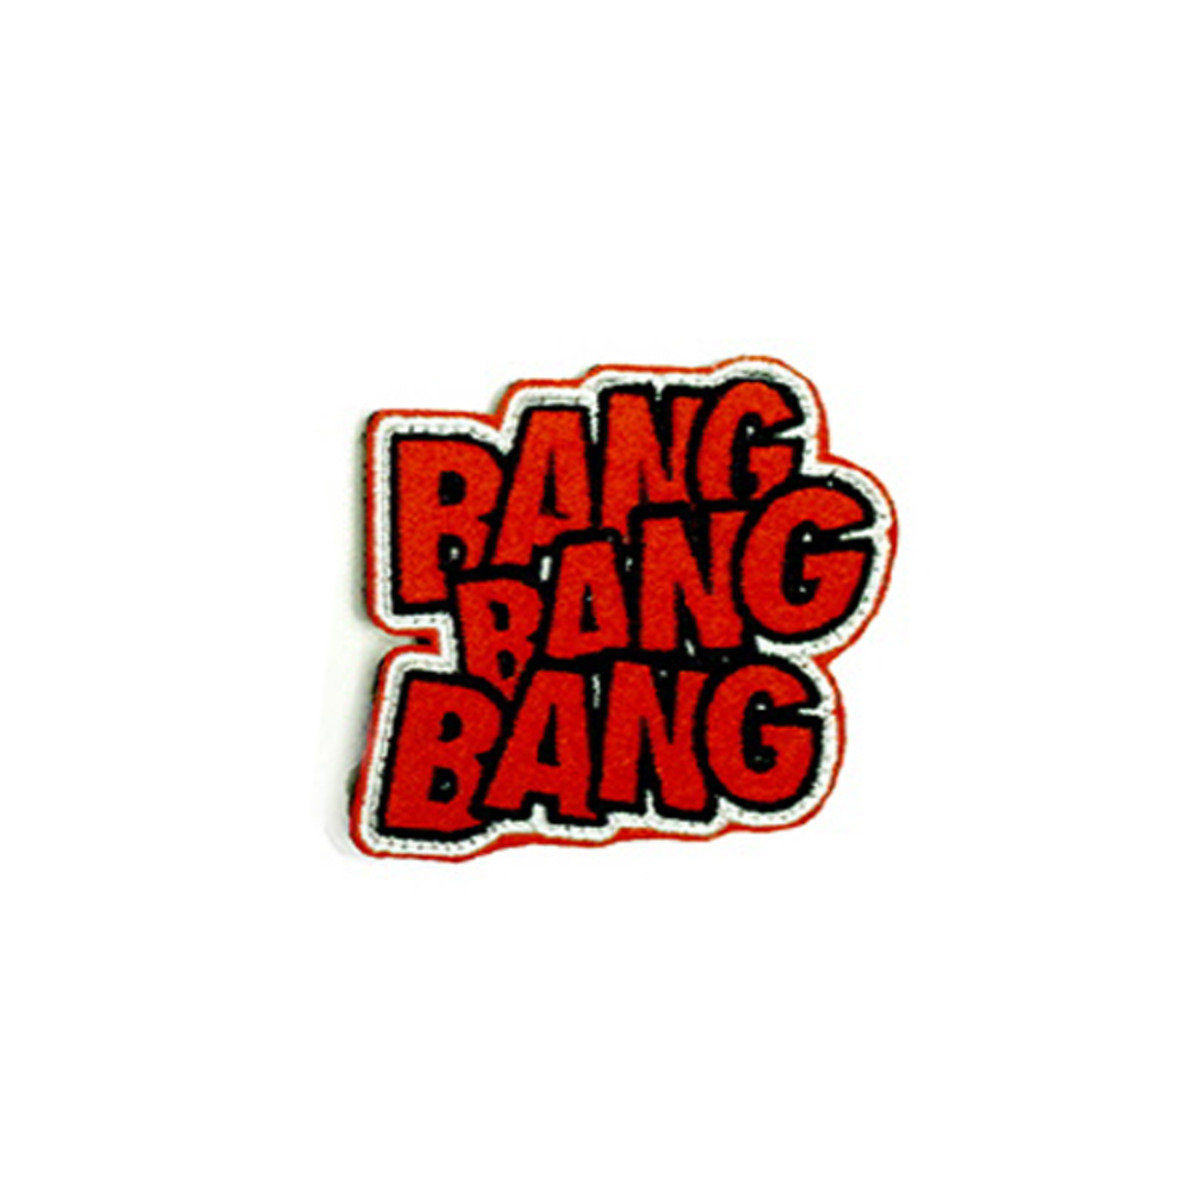 BIGBANG - 襟章 (BANGBANGBANG) [BIGBANG WORLD TOUR 'MADE' FINAL IN SEOUL]